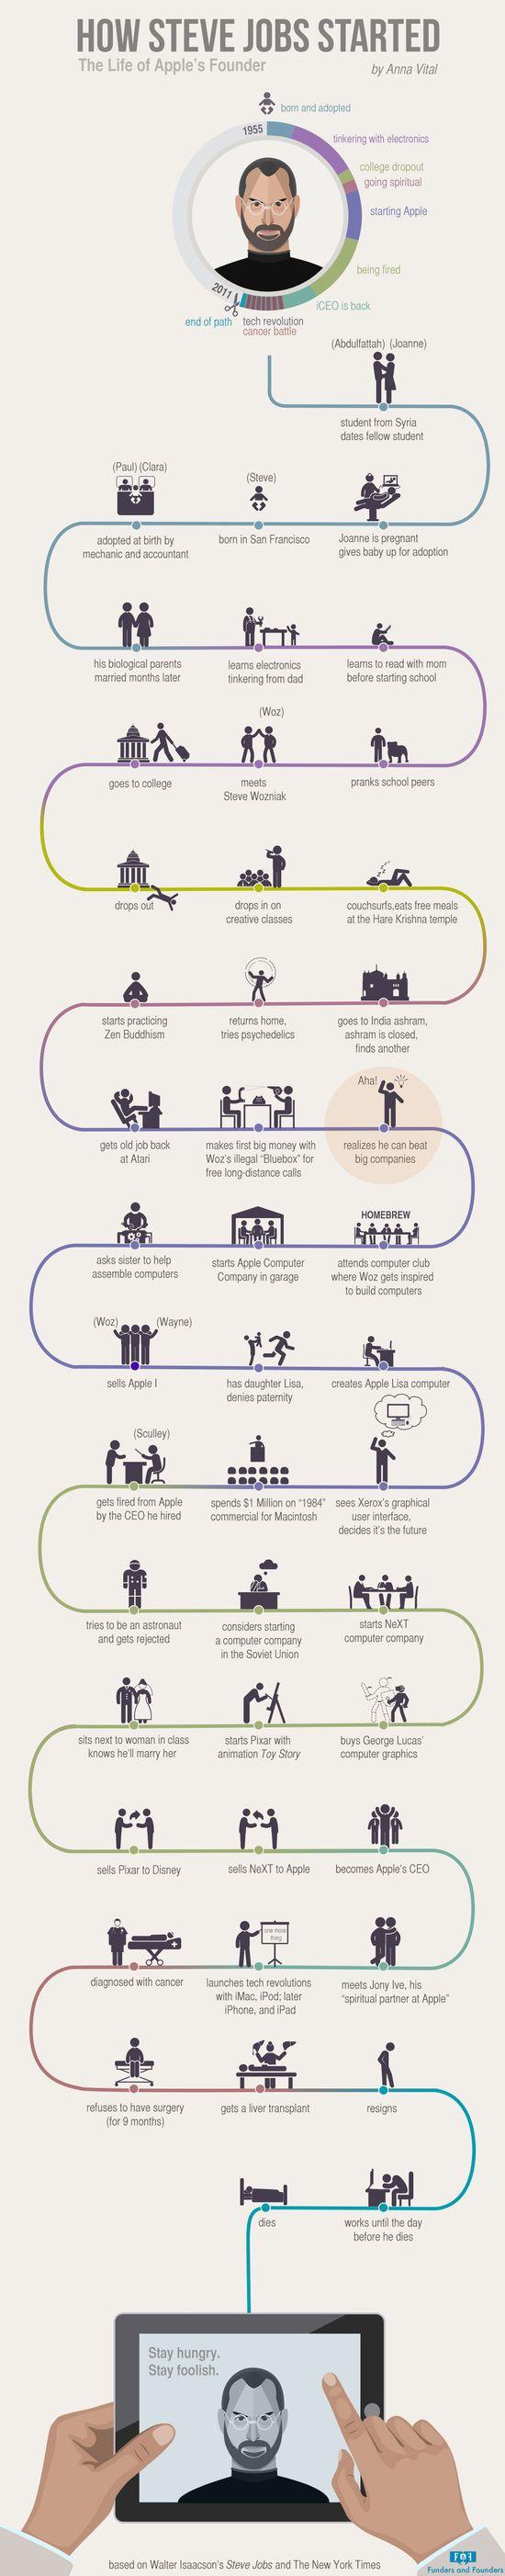 How-steve-jobs-started-infographic